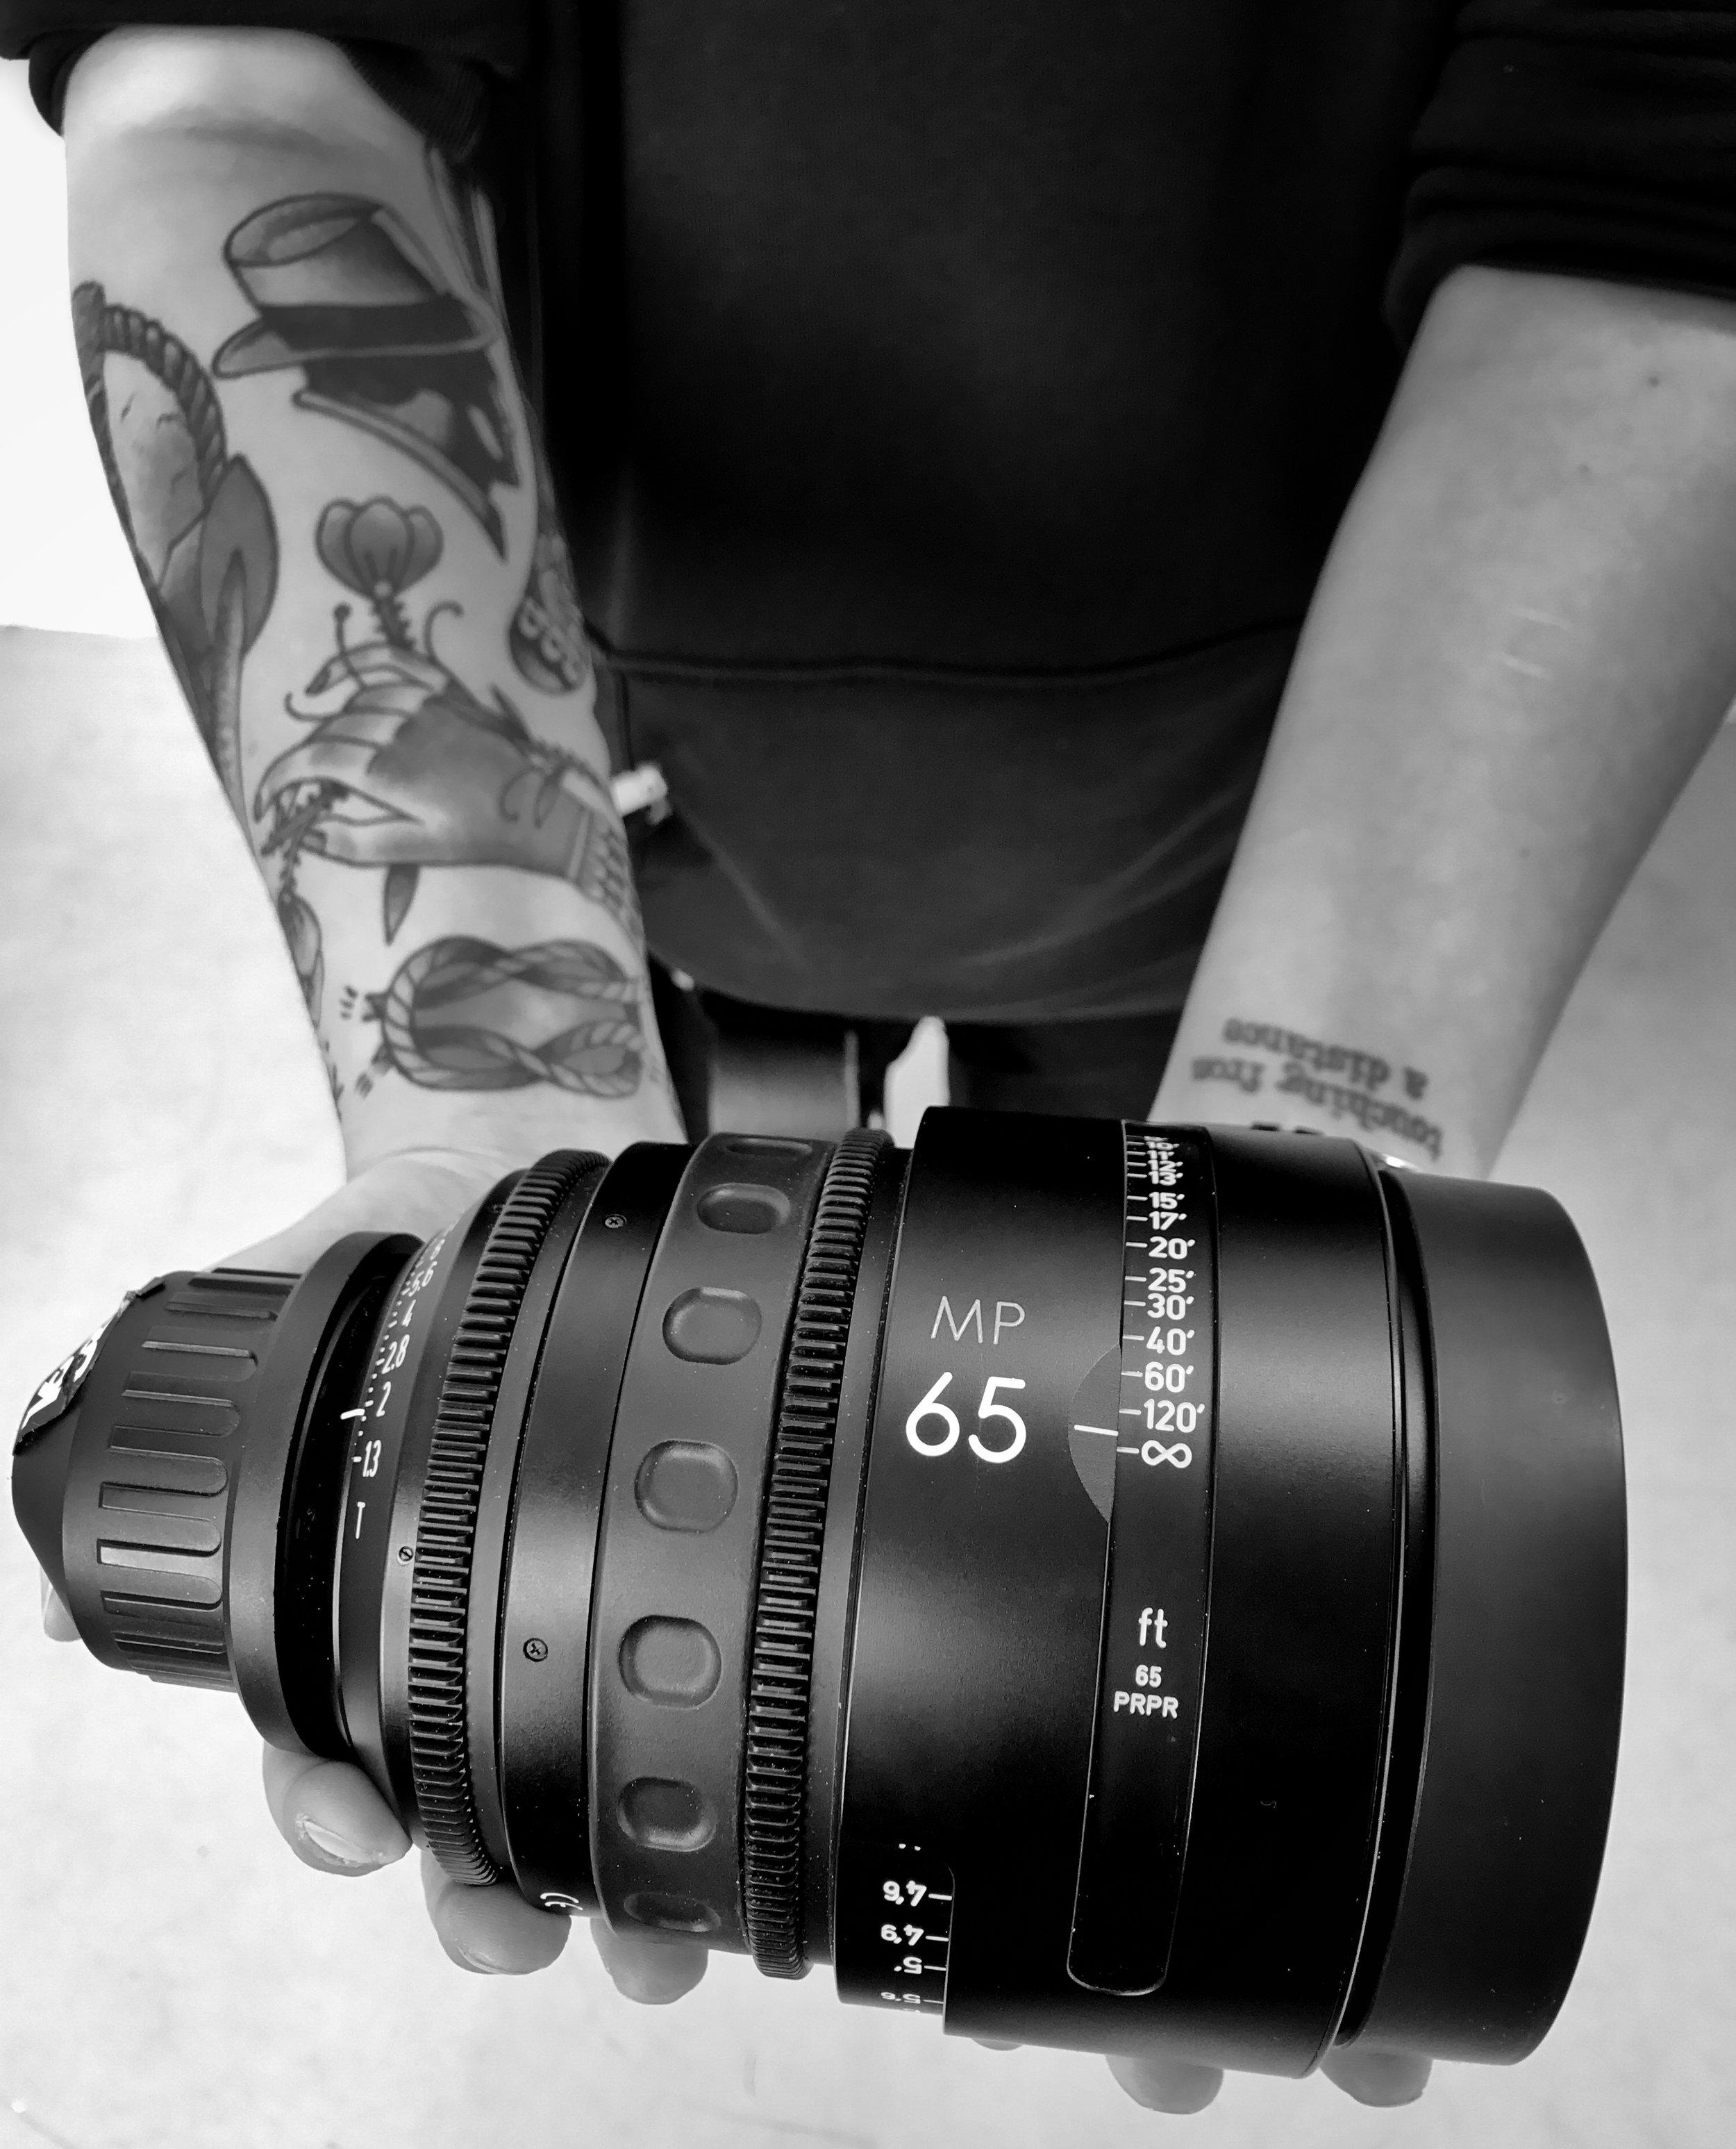 Arri/Zeiss Materprime 65mm